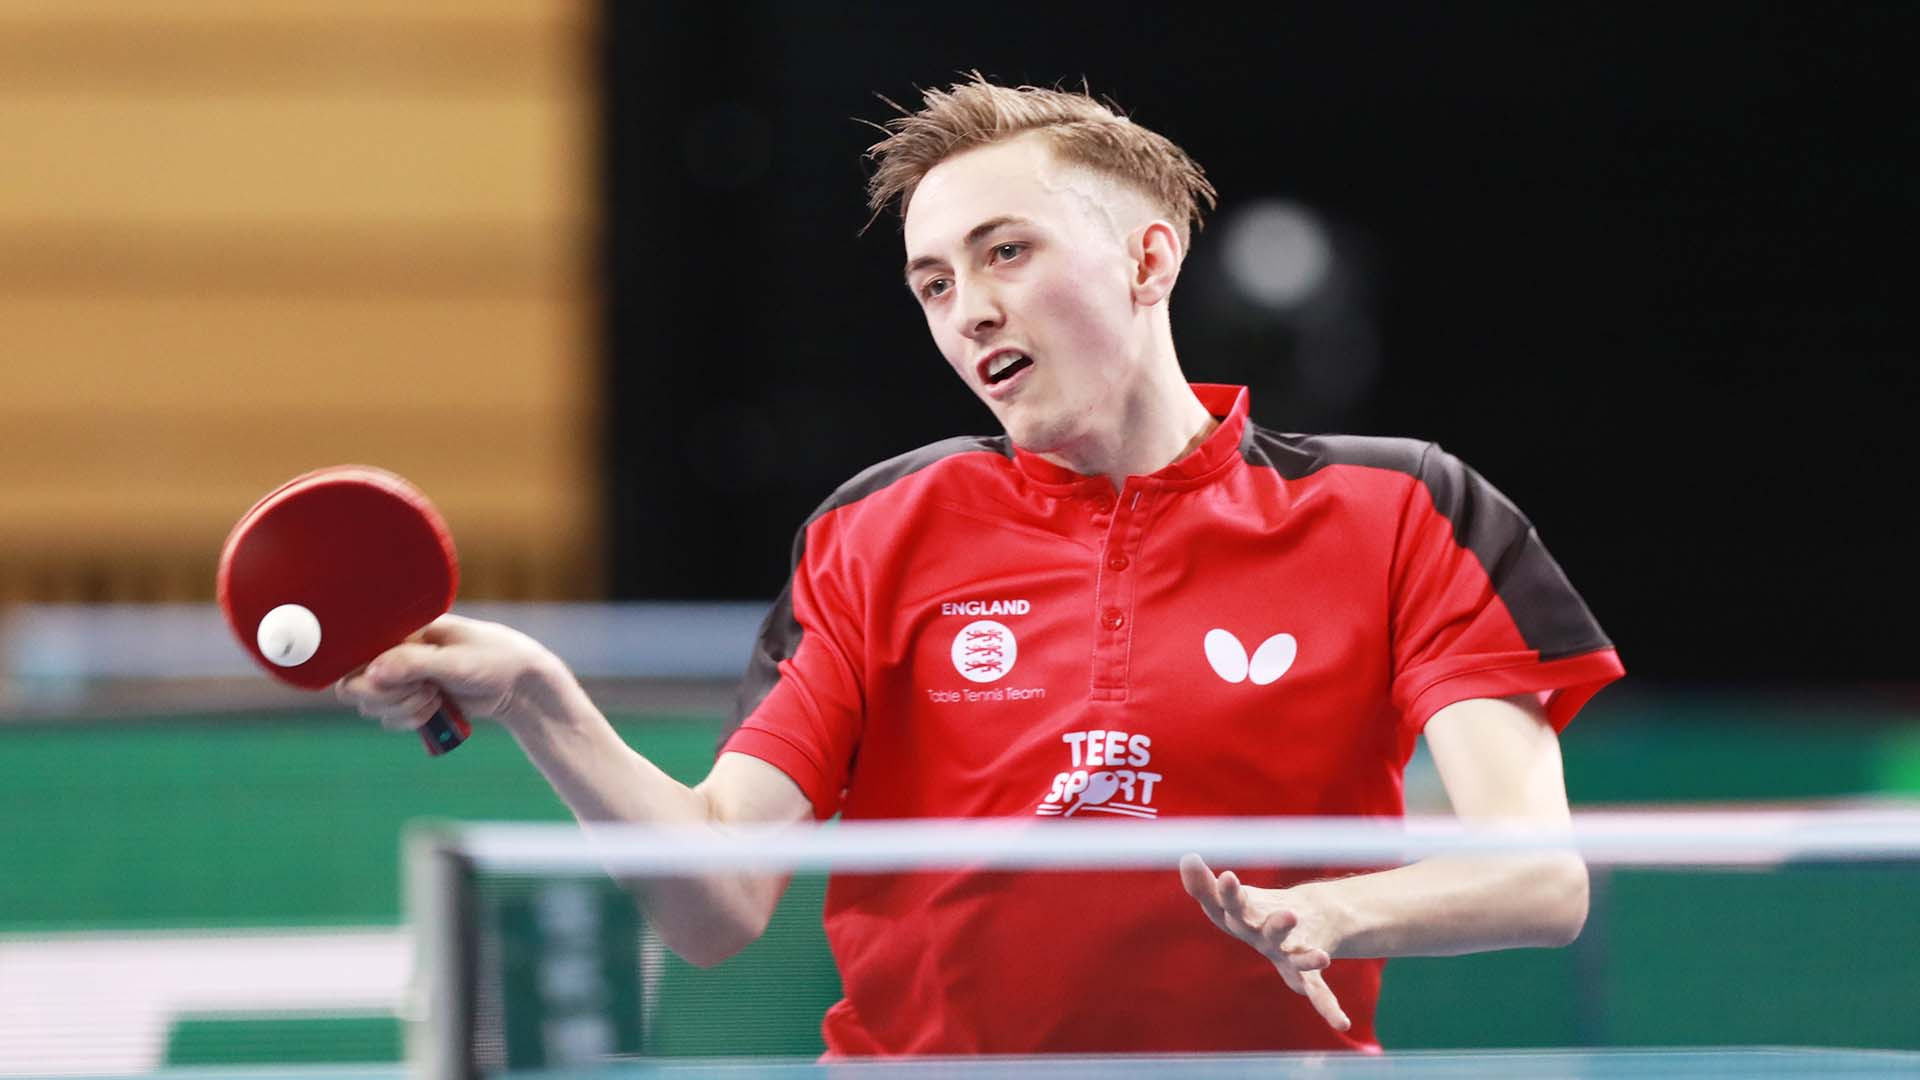 Hosts England beat Brazil to reach ITTF Team World Cup last four